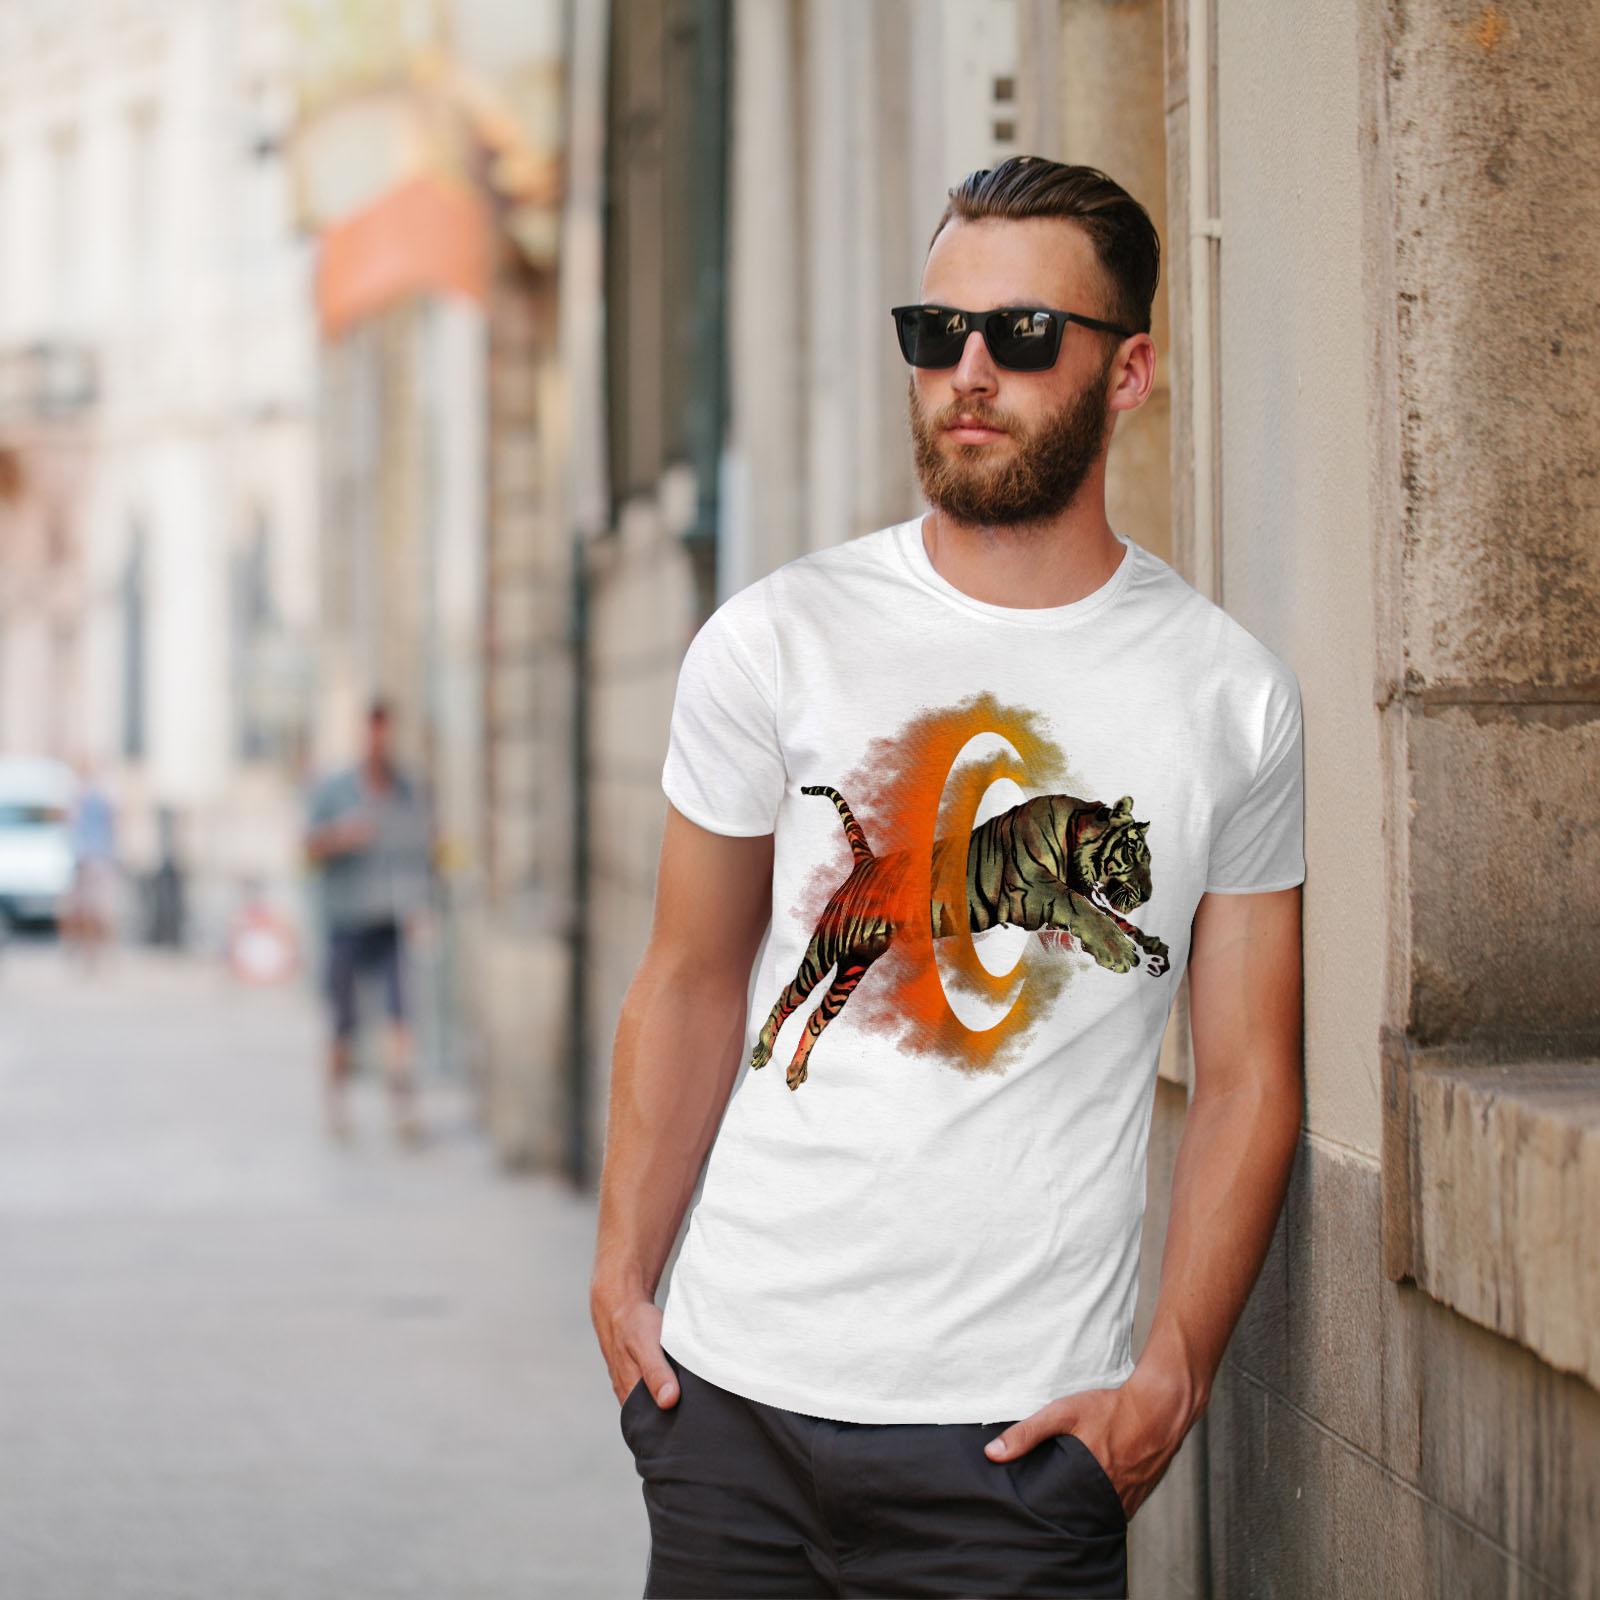 Wellcoda-Tiger-Portal-Cool-Mens-T-shirt-Flame-Graphic-Design-Printed-Tee thumbnail 11